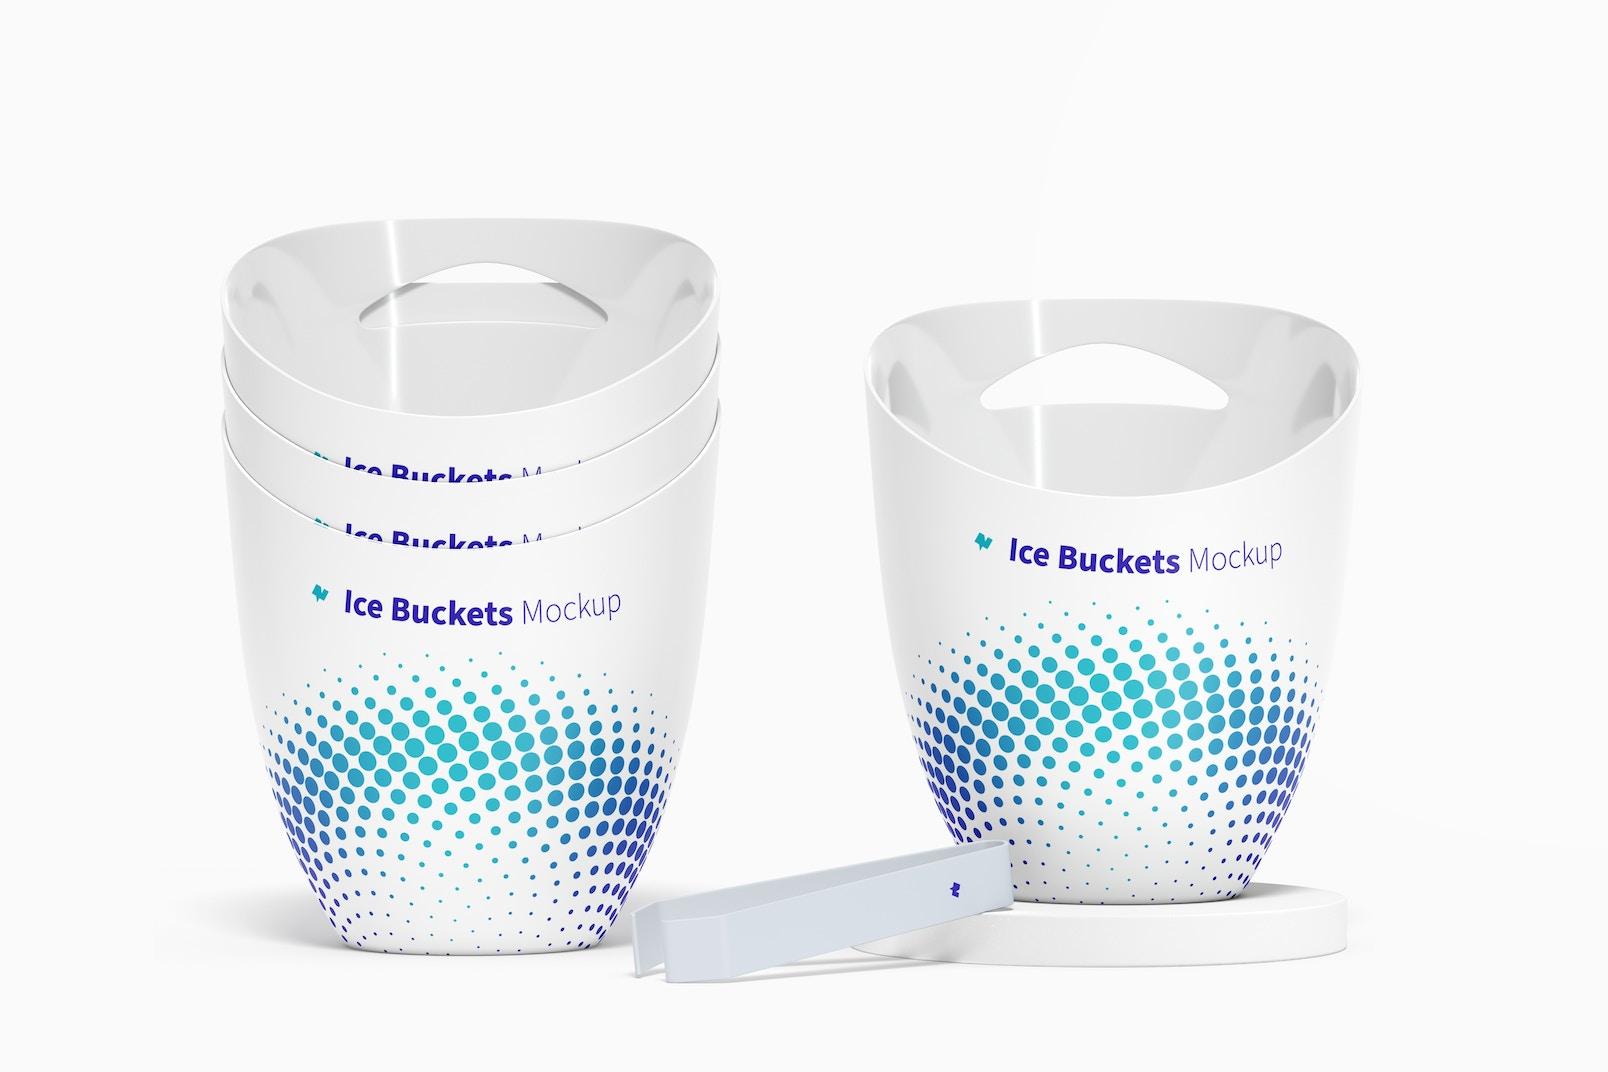 Ice Buckets Mockup, Stacked Set